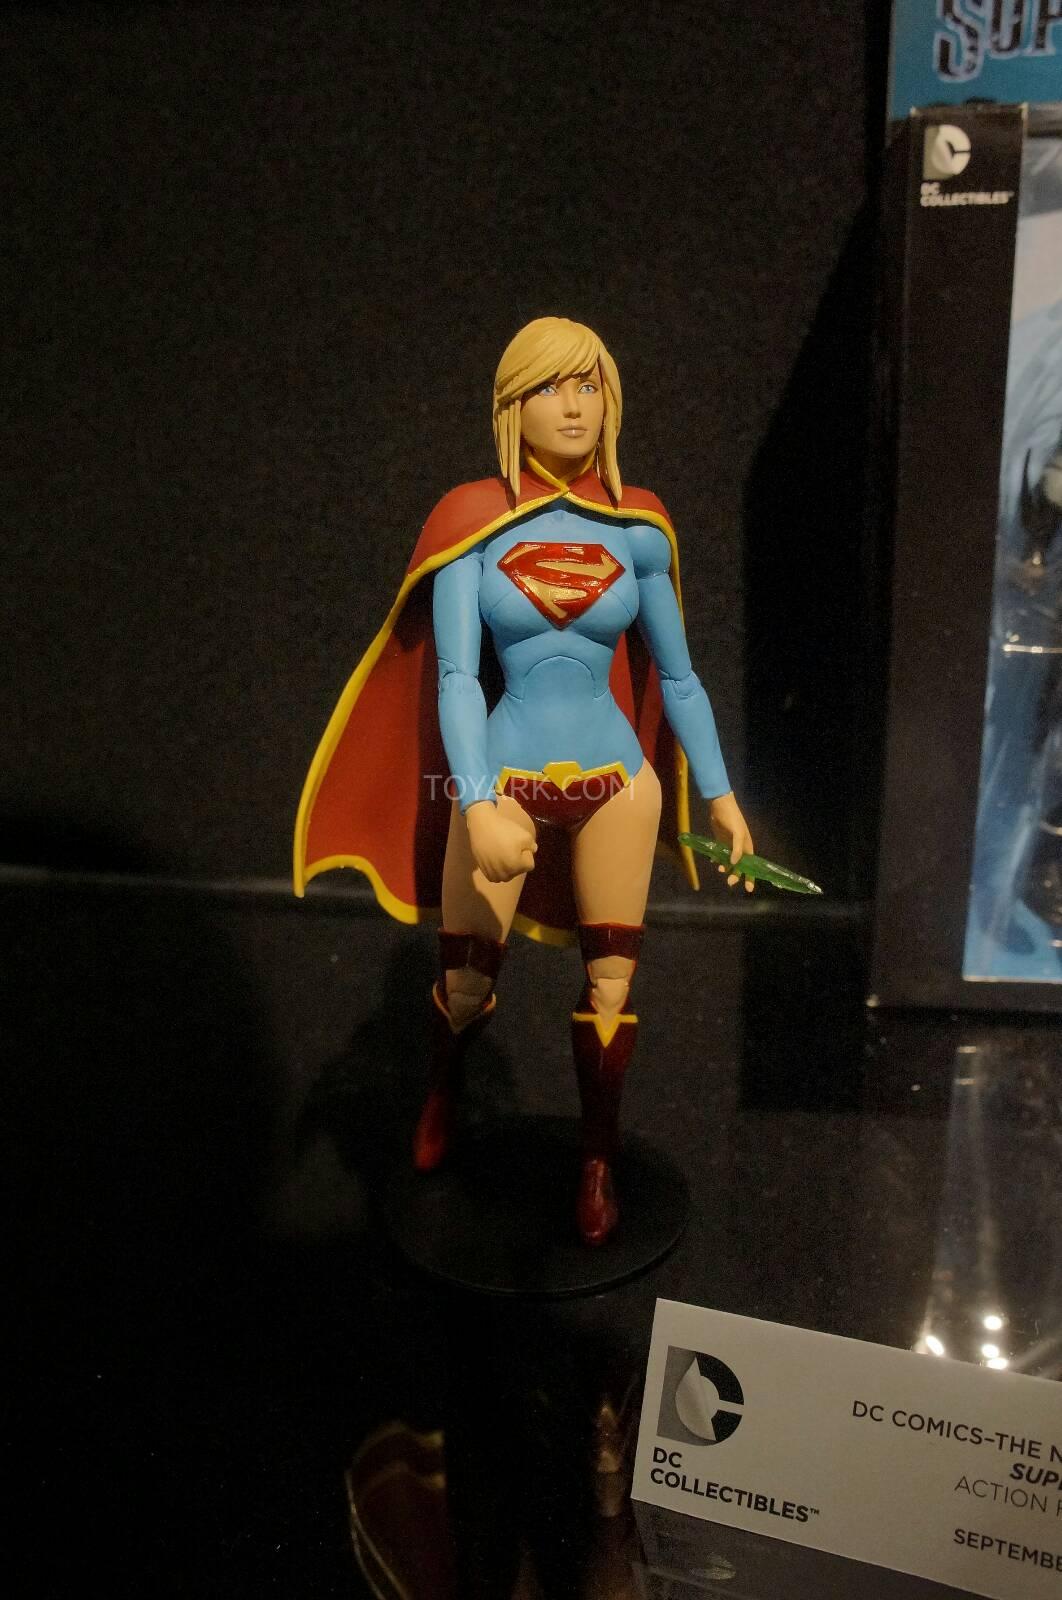 [Toy Fair 2014] DC Collectibles Toy-Fair-2014-DC-Collectibles-119